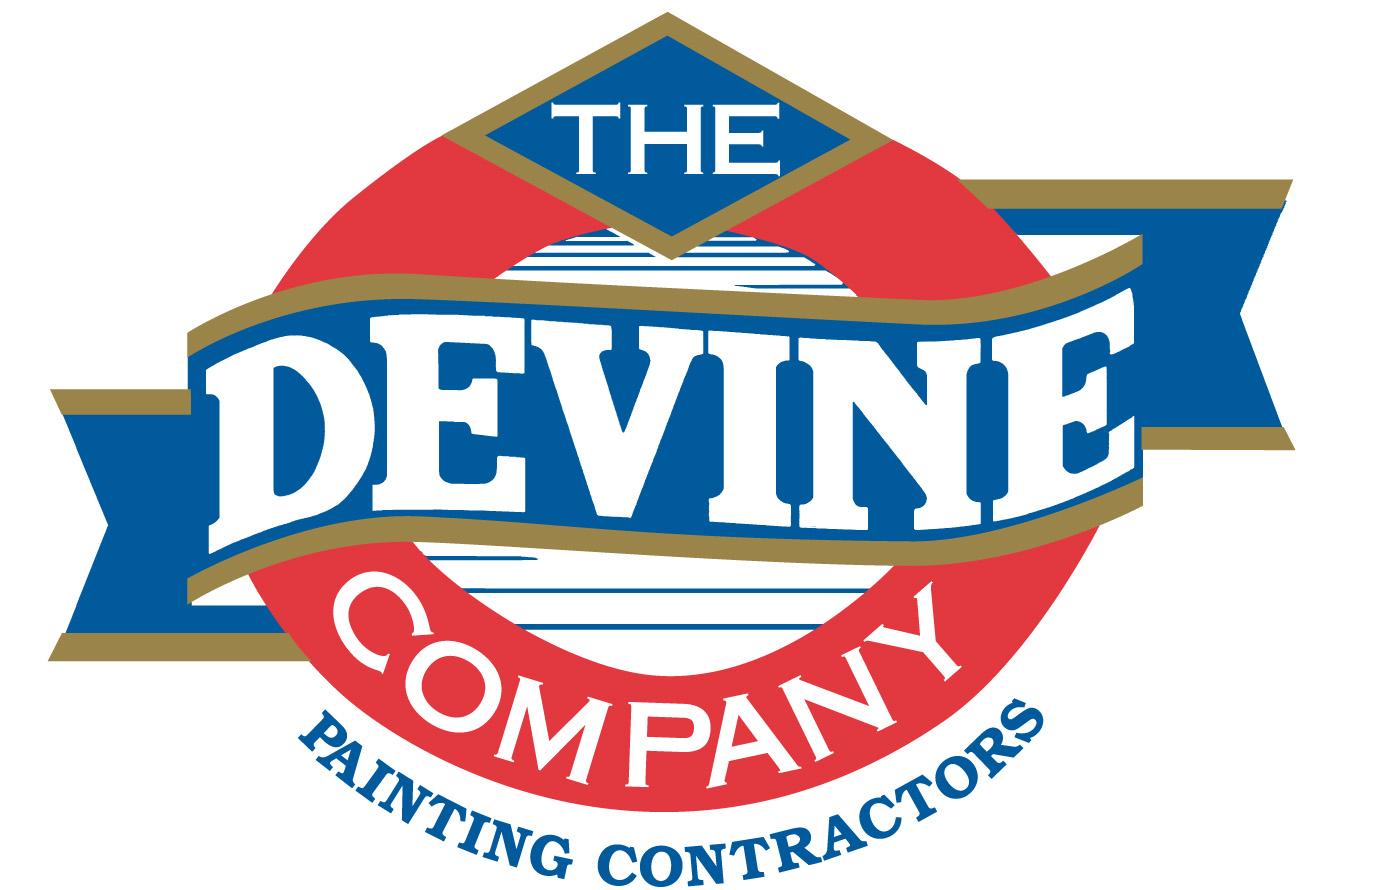 Devine Co Painting